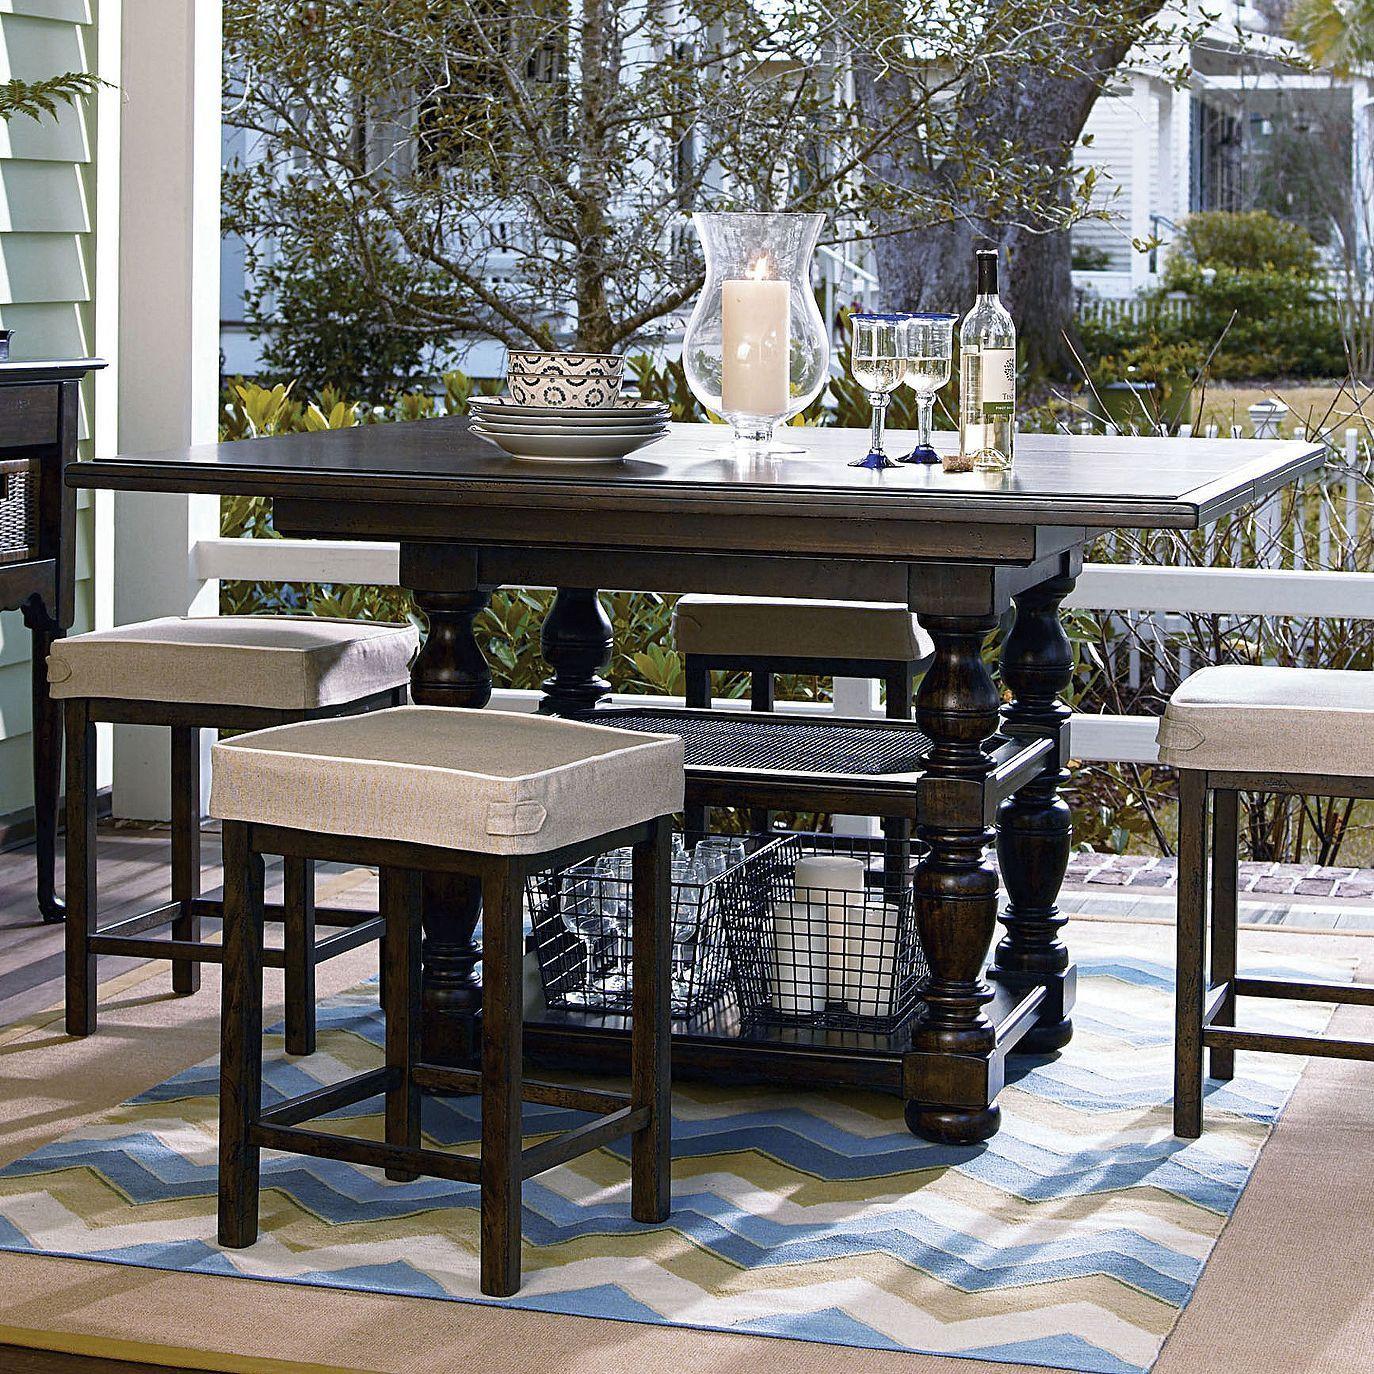 Universal Furniture Paula Deen Down Home Gathering Table In Molasses Finish Paula Deen Furniture Universal Furniture Dining Table In Kitchen #paula #deen #living #room #furniture